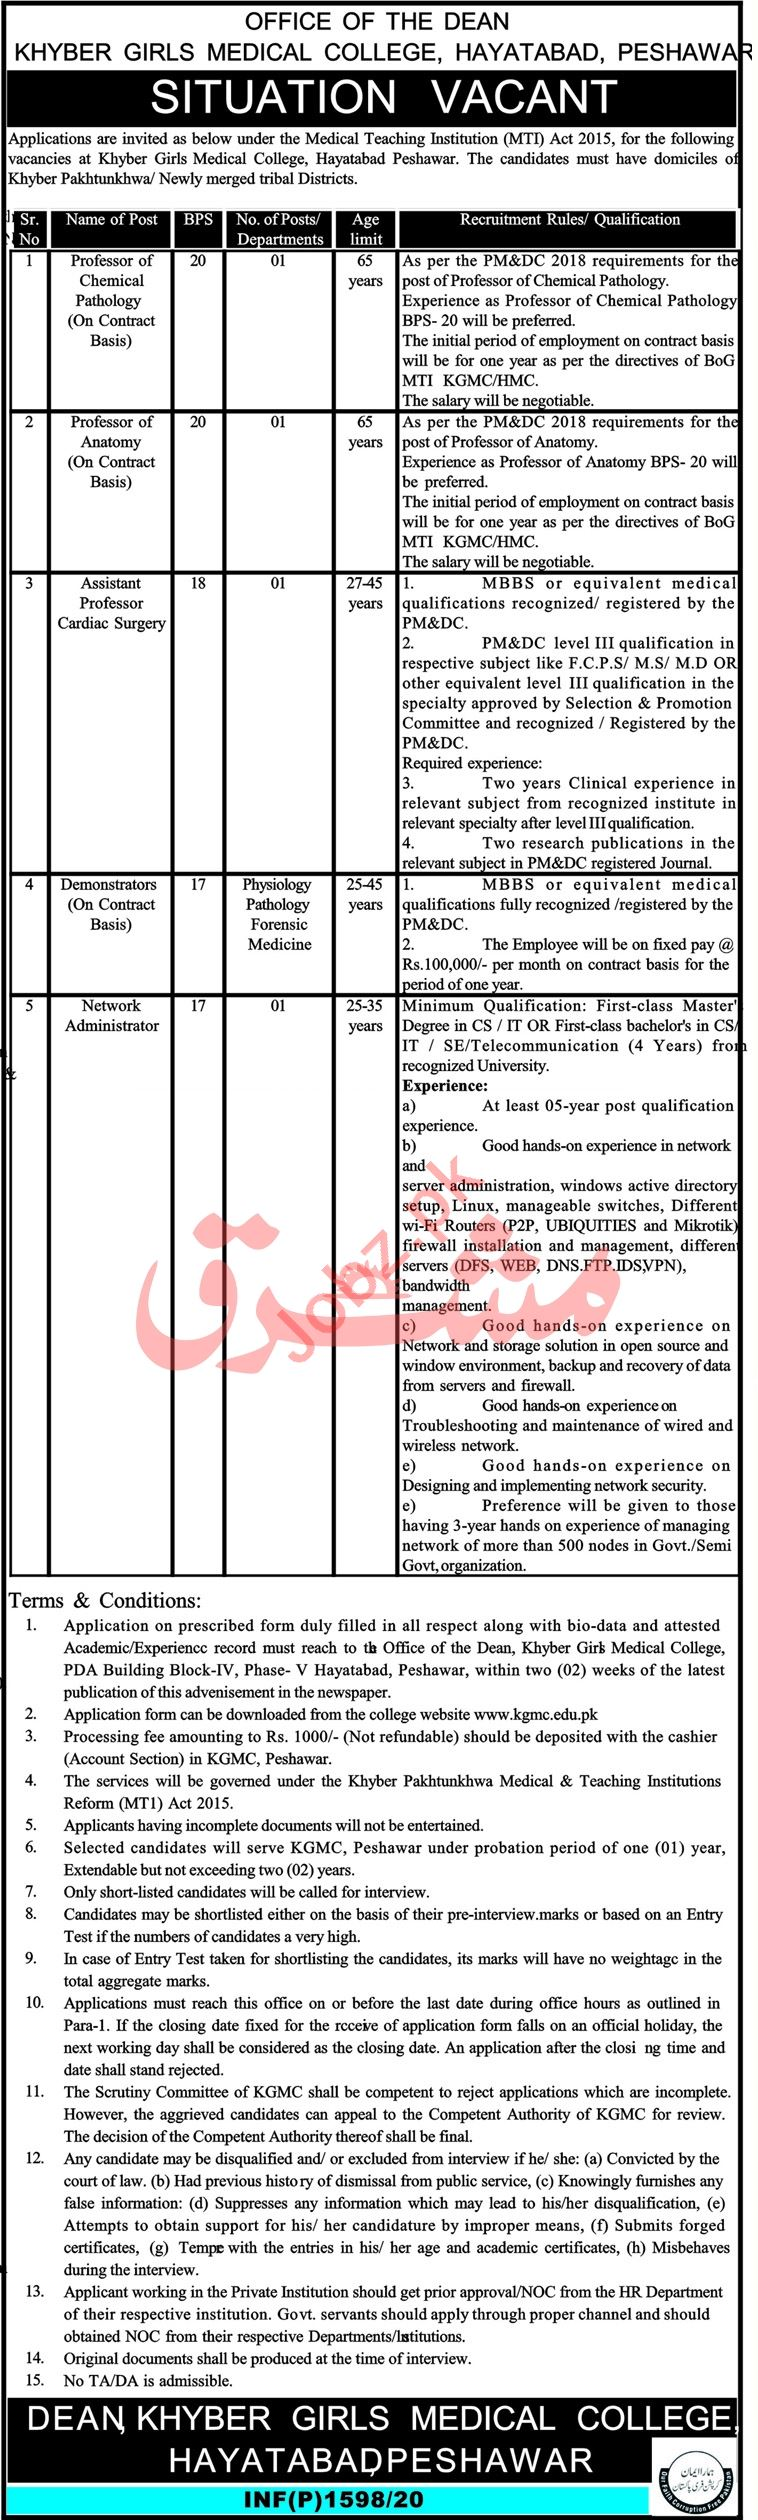 Khyber Girls Medical College KGMC Peshawar Jobs 2020